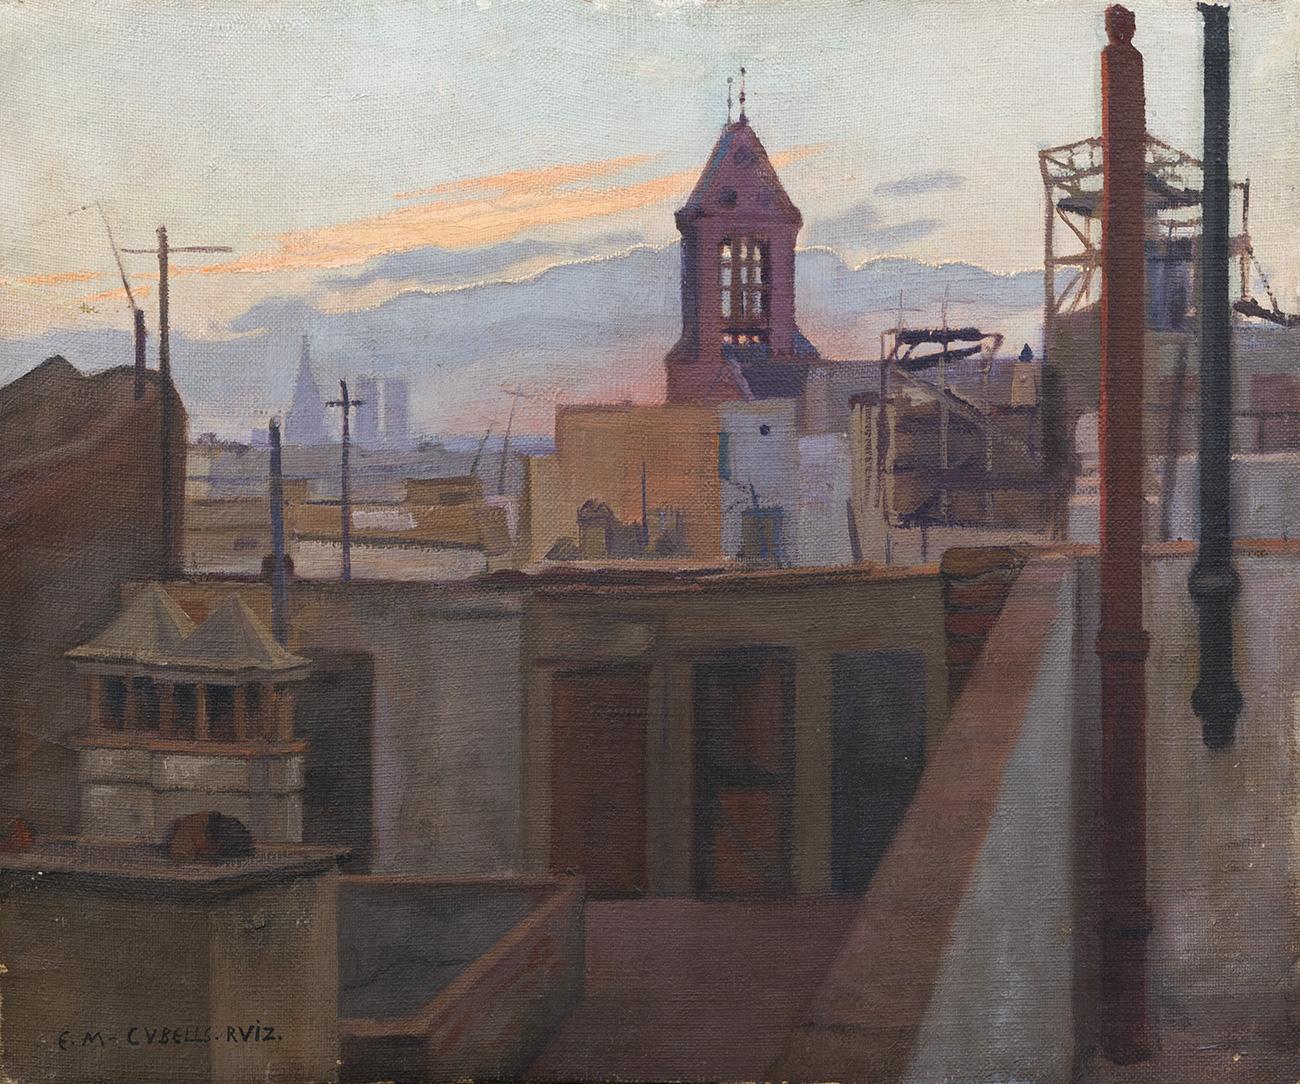 Enrique Martínez-Cubells Ruiz (Madrid, 1874 – Málaga, 1947).